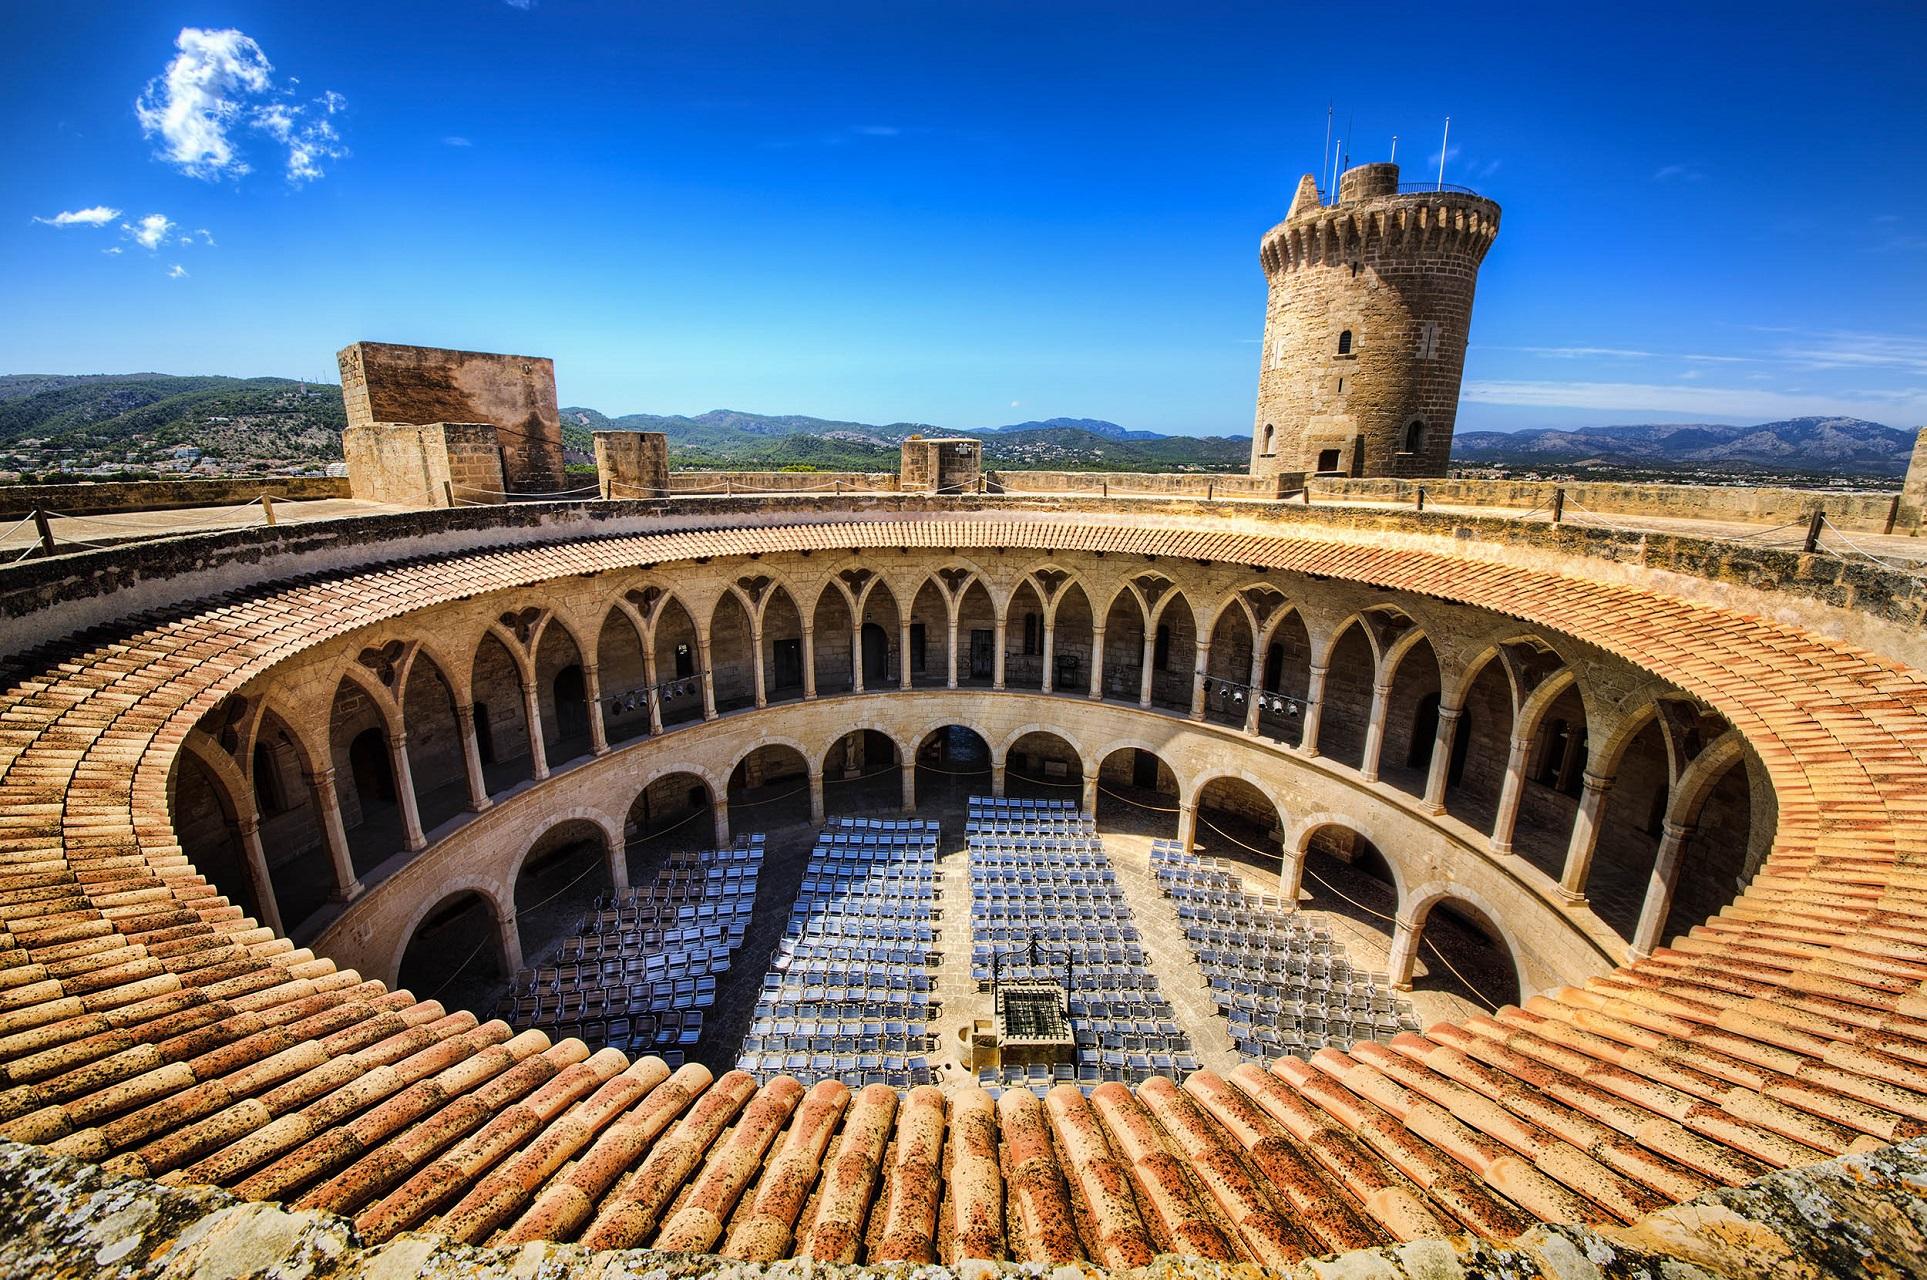 Die Festung Castell de Bellver in Palma de Mallorca.